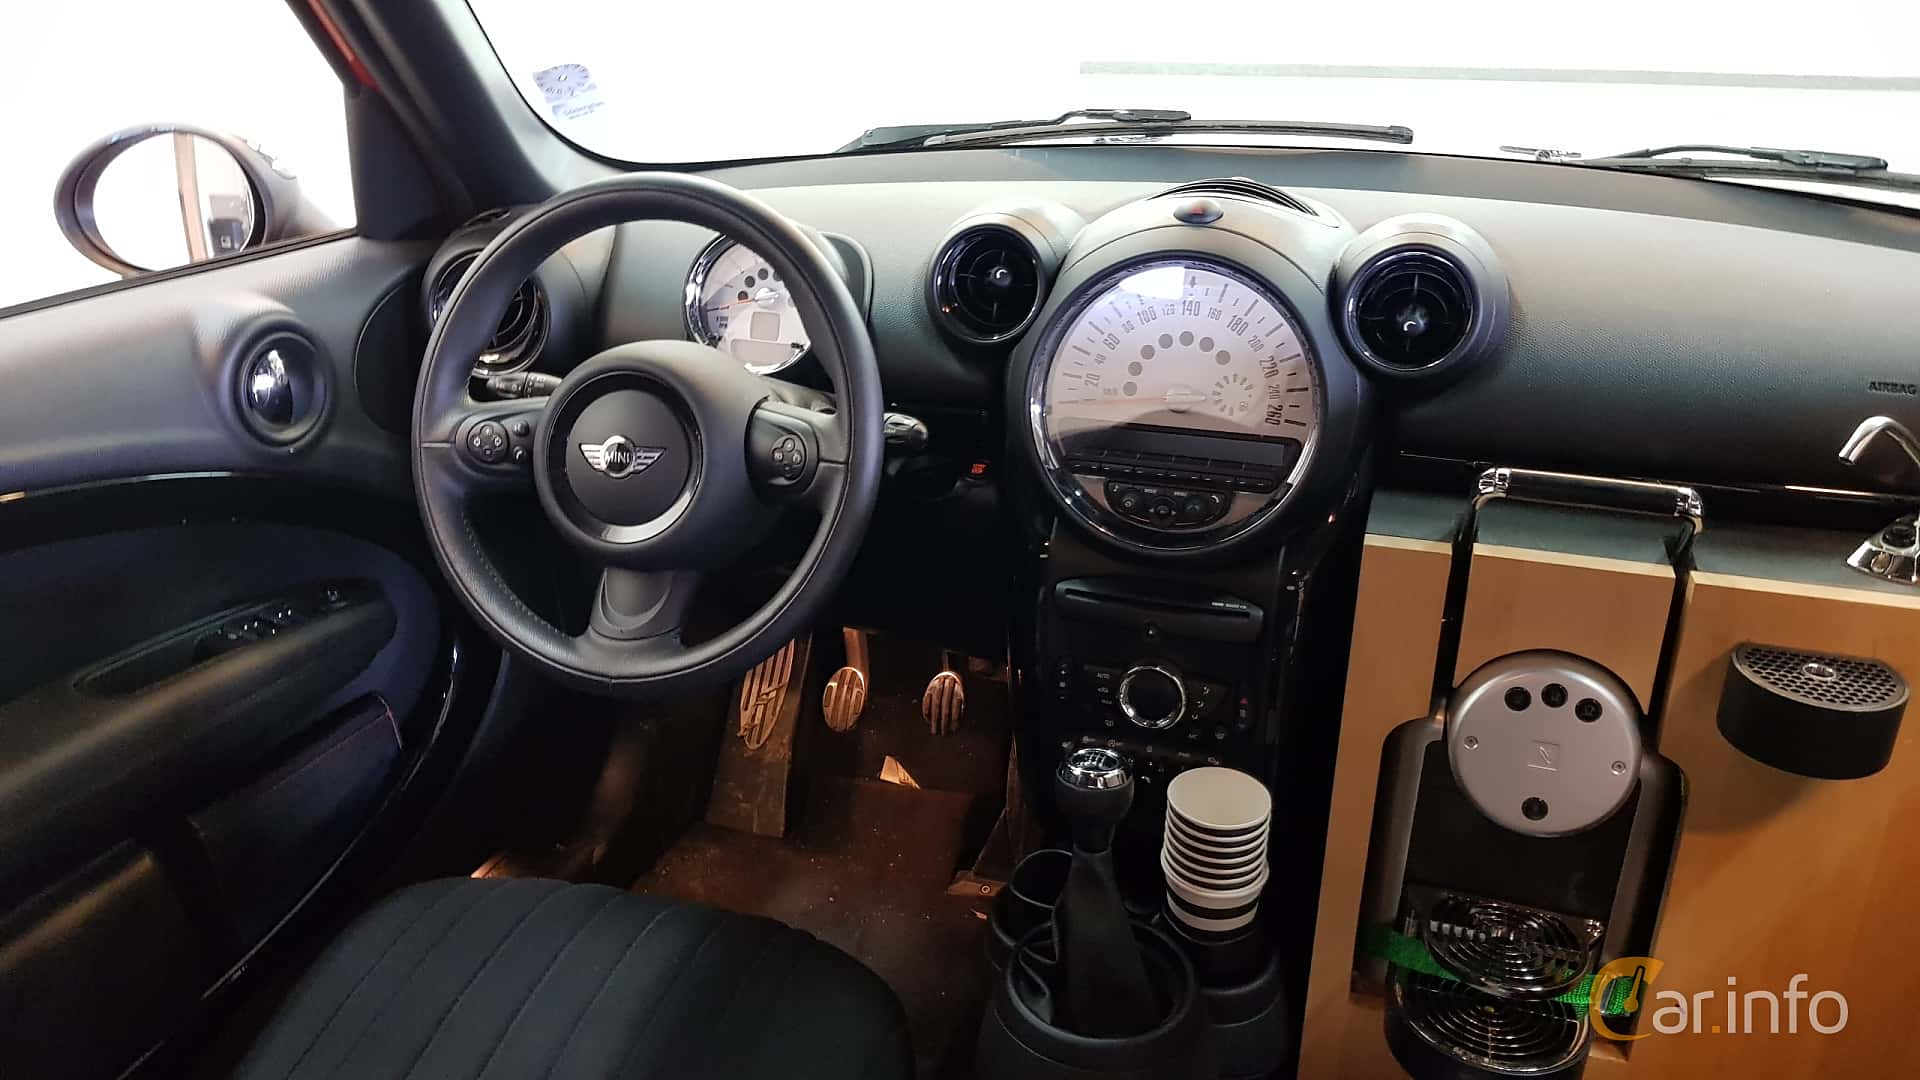 Mini Cooper S Countryman Manual 184hp 2014